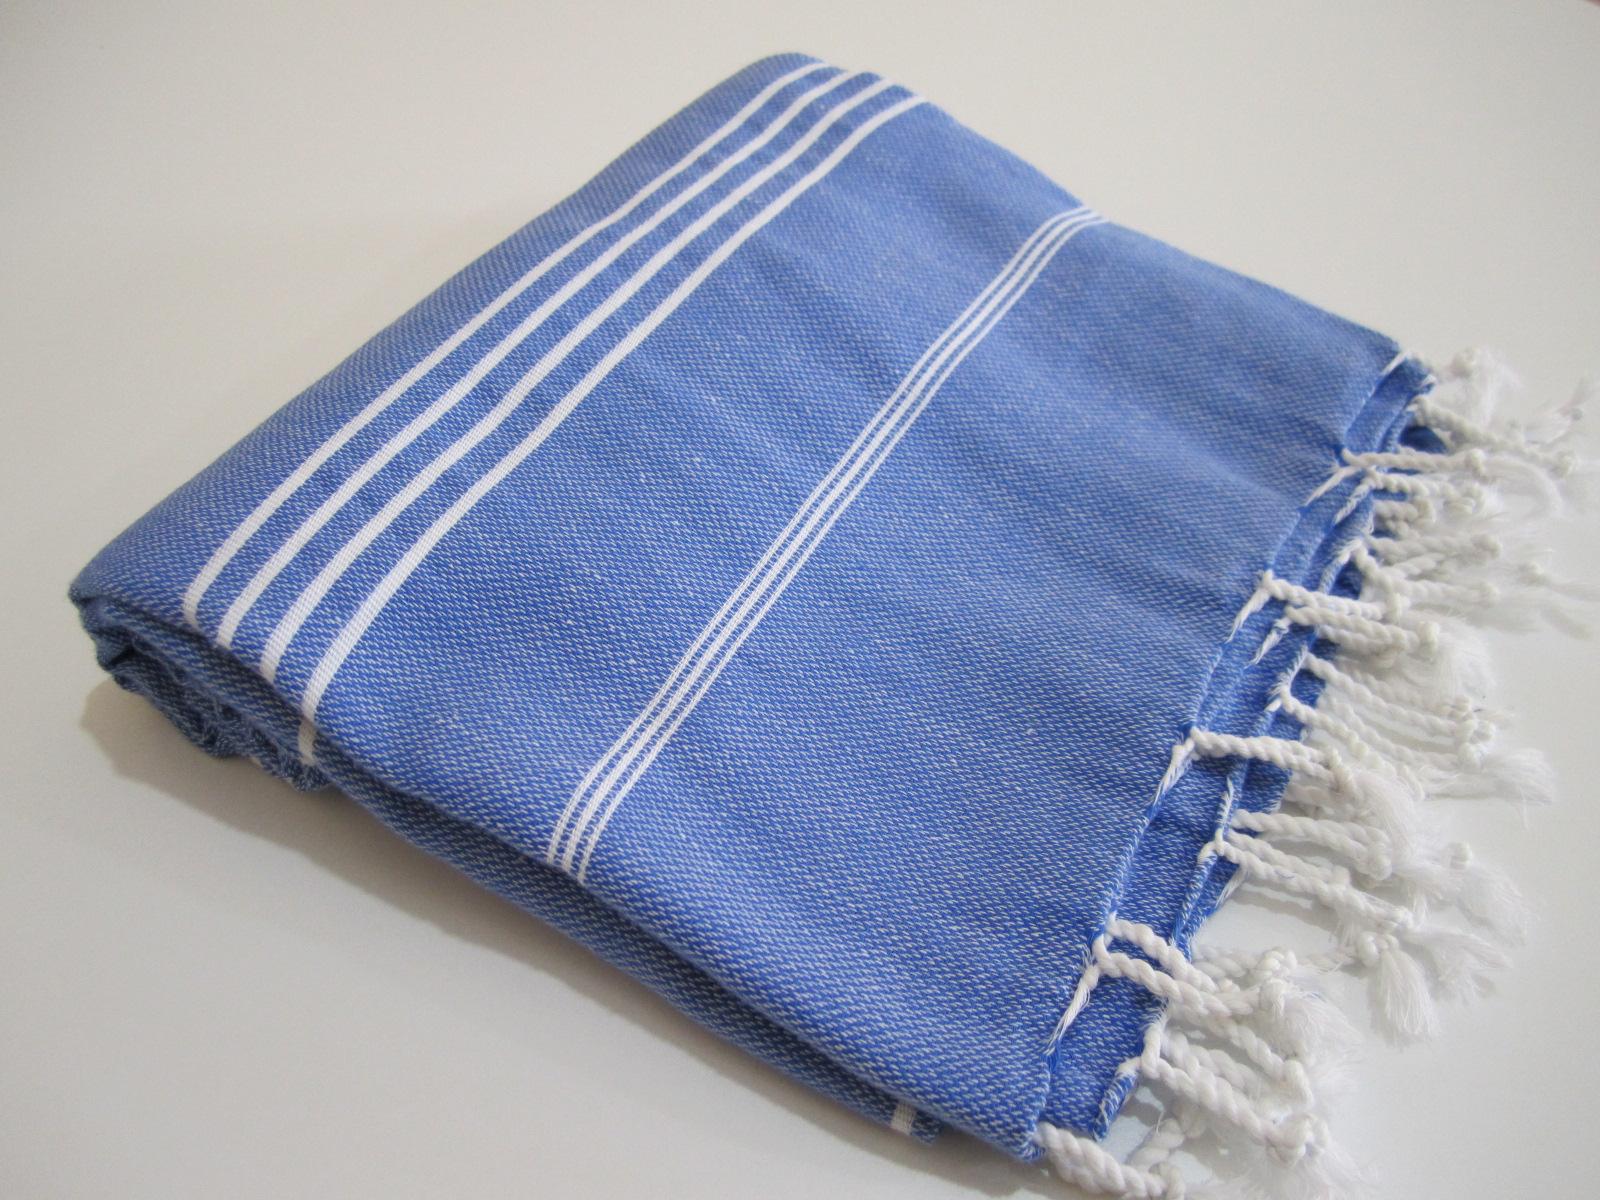 high quality Turkishpeshtemal fouta towel